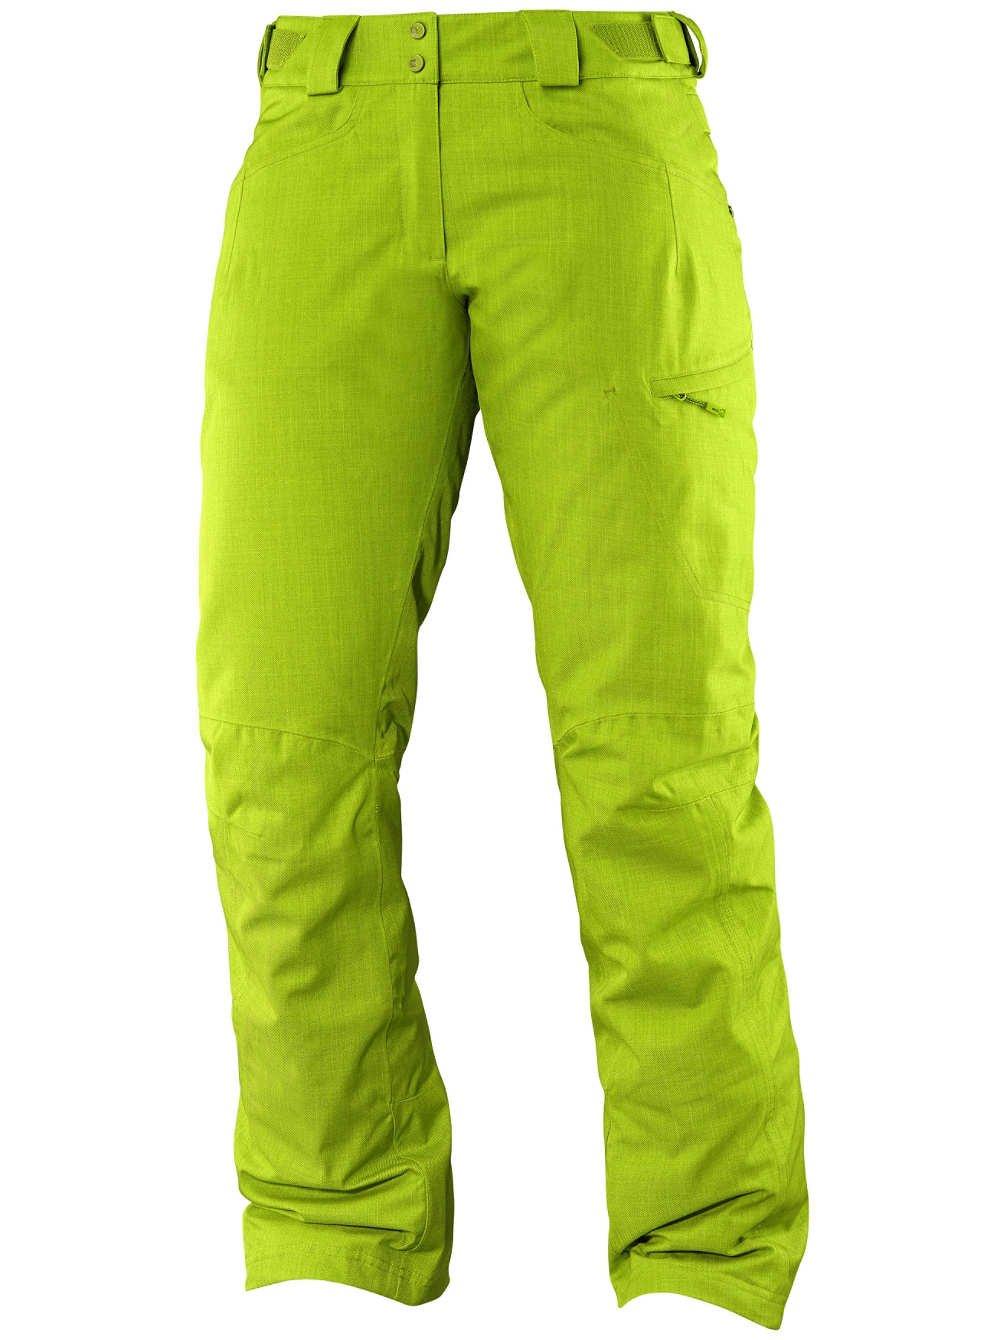 Damen Snowboard Hose Salomon Fantasy Pants